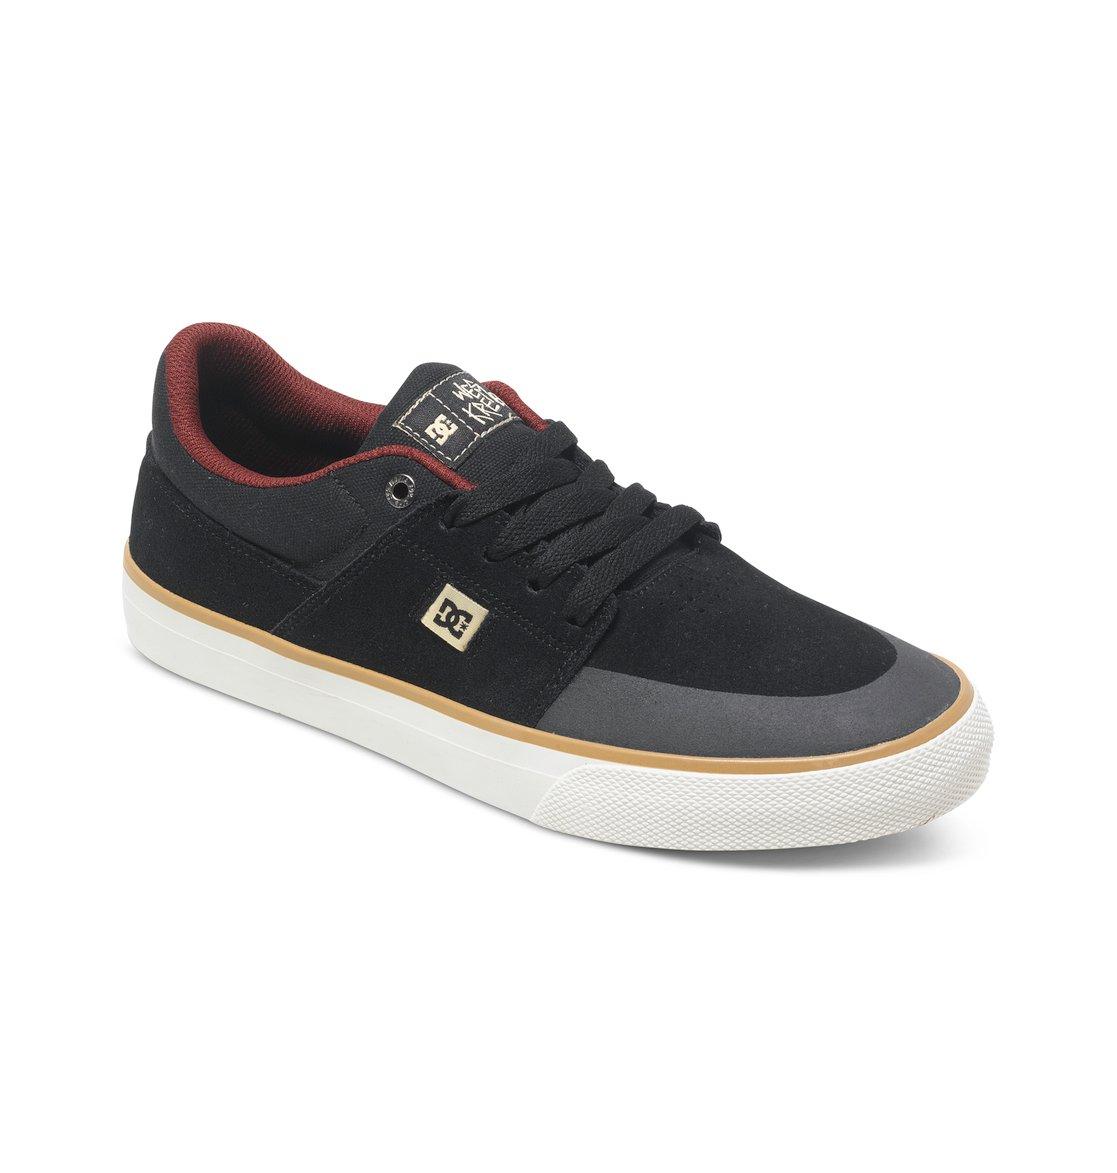 wes kremer s se low top skate shoes adys300144 dc shoes